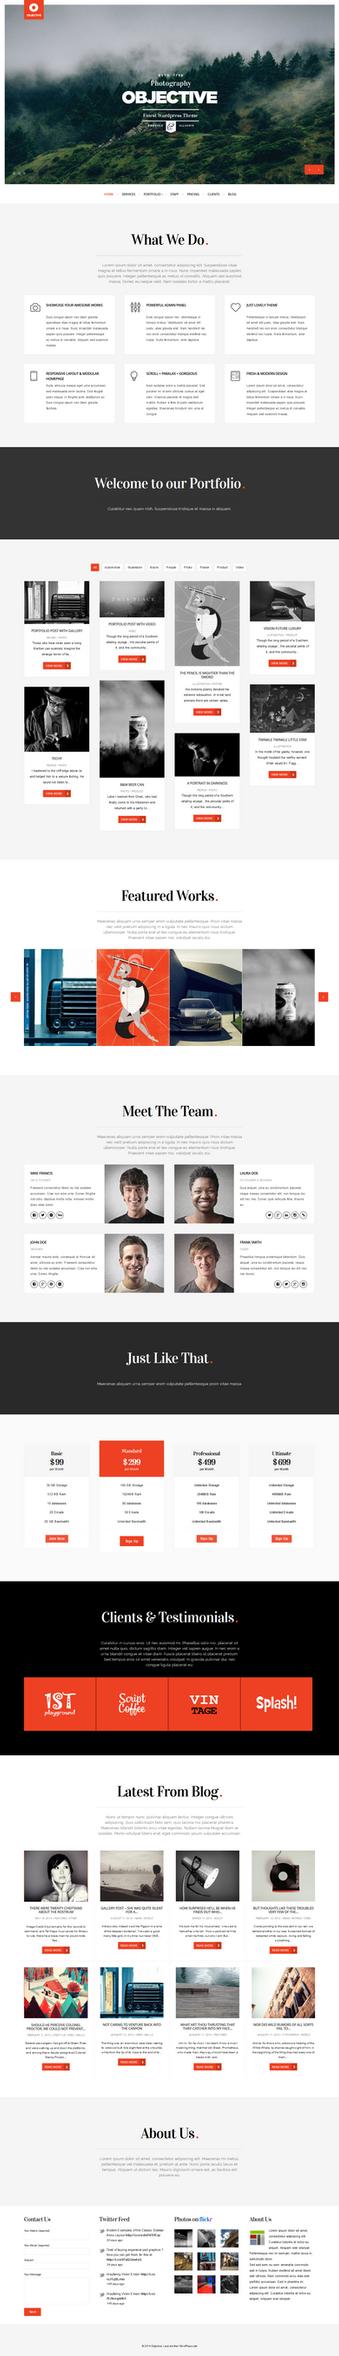 Objective - Responsive Portfolio Photography Theme by sandracz